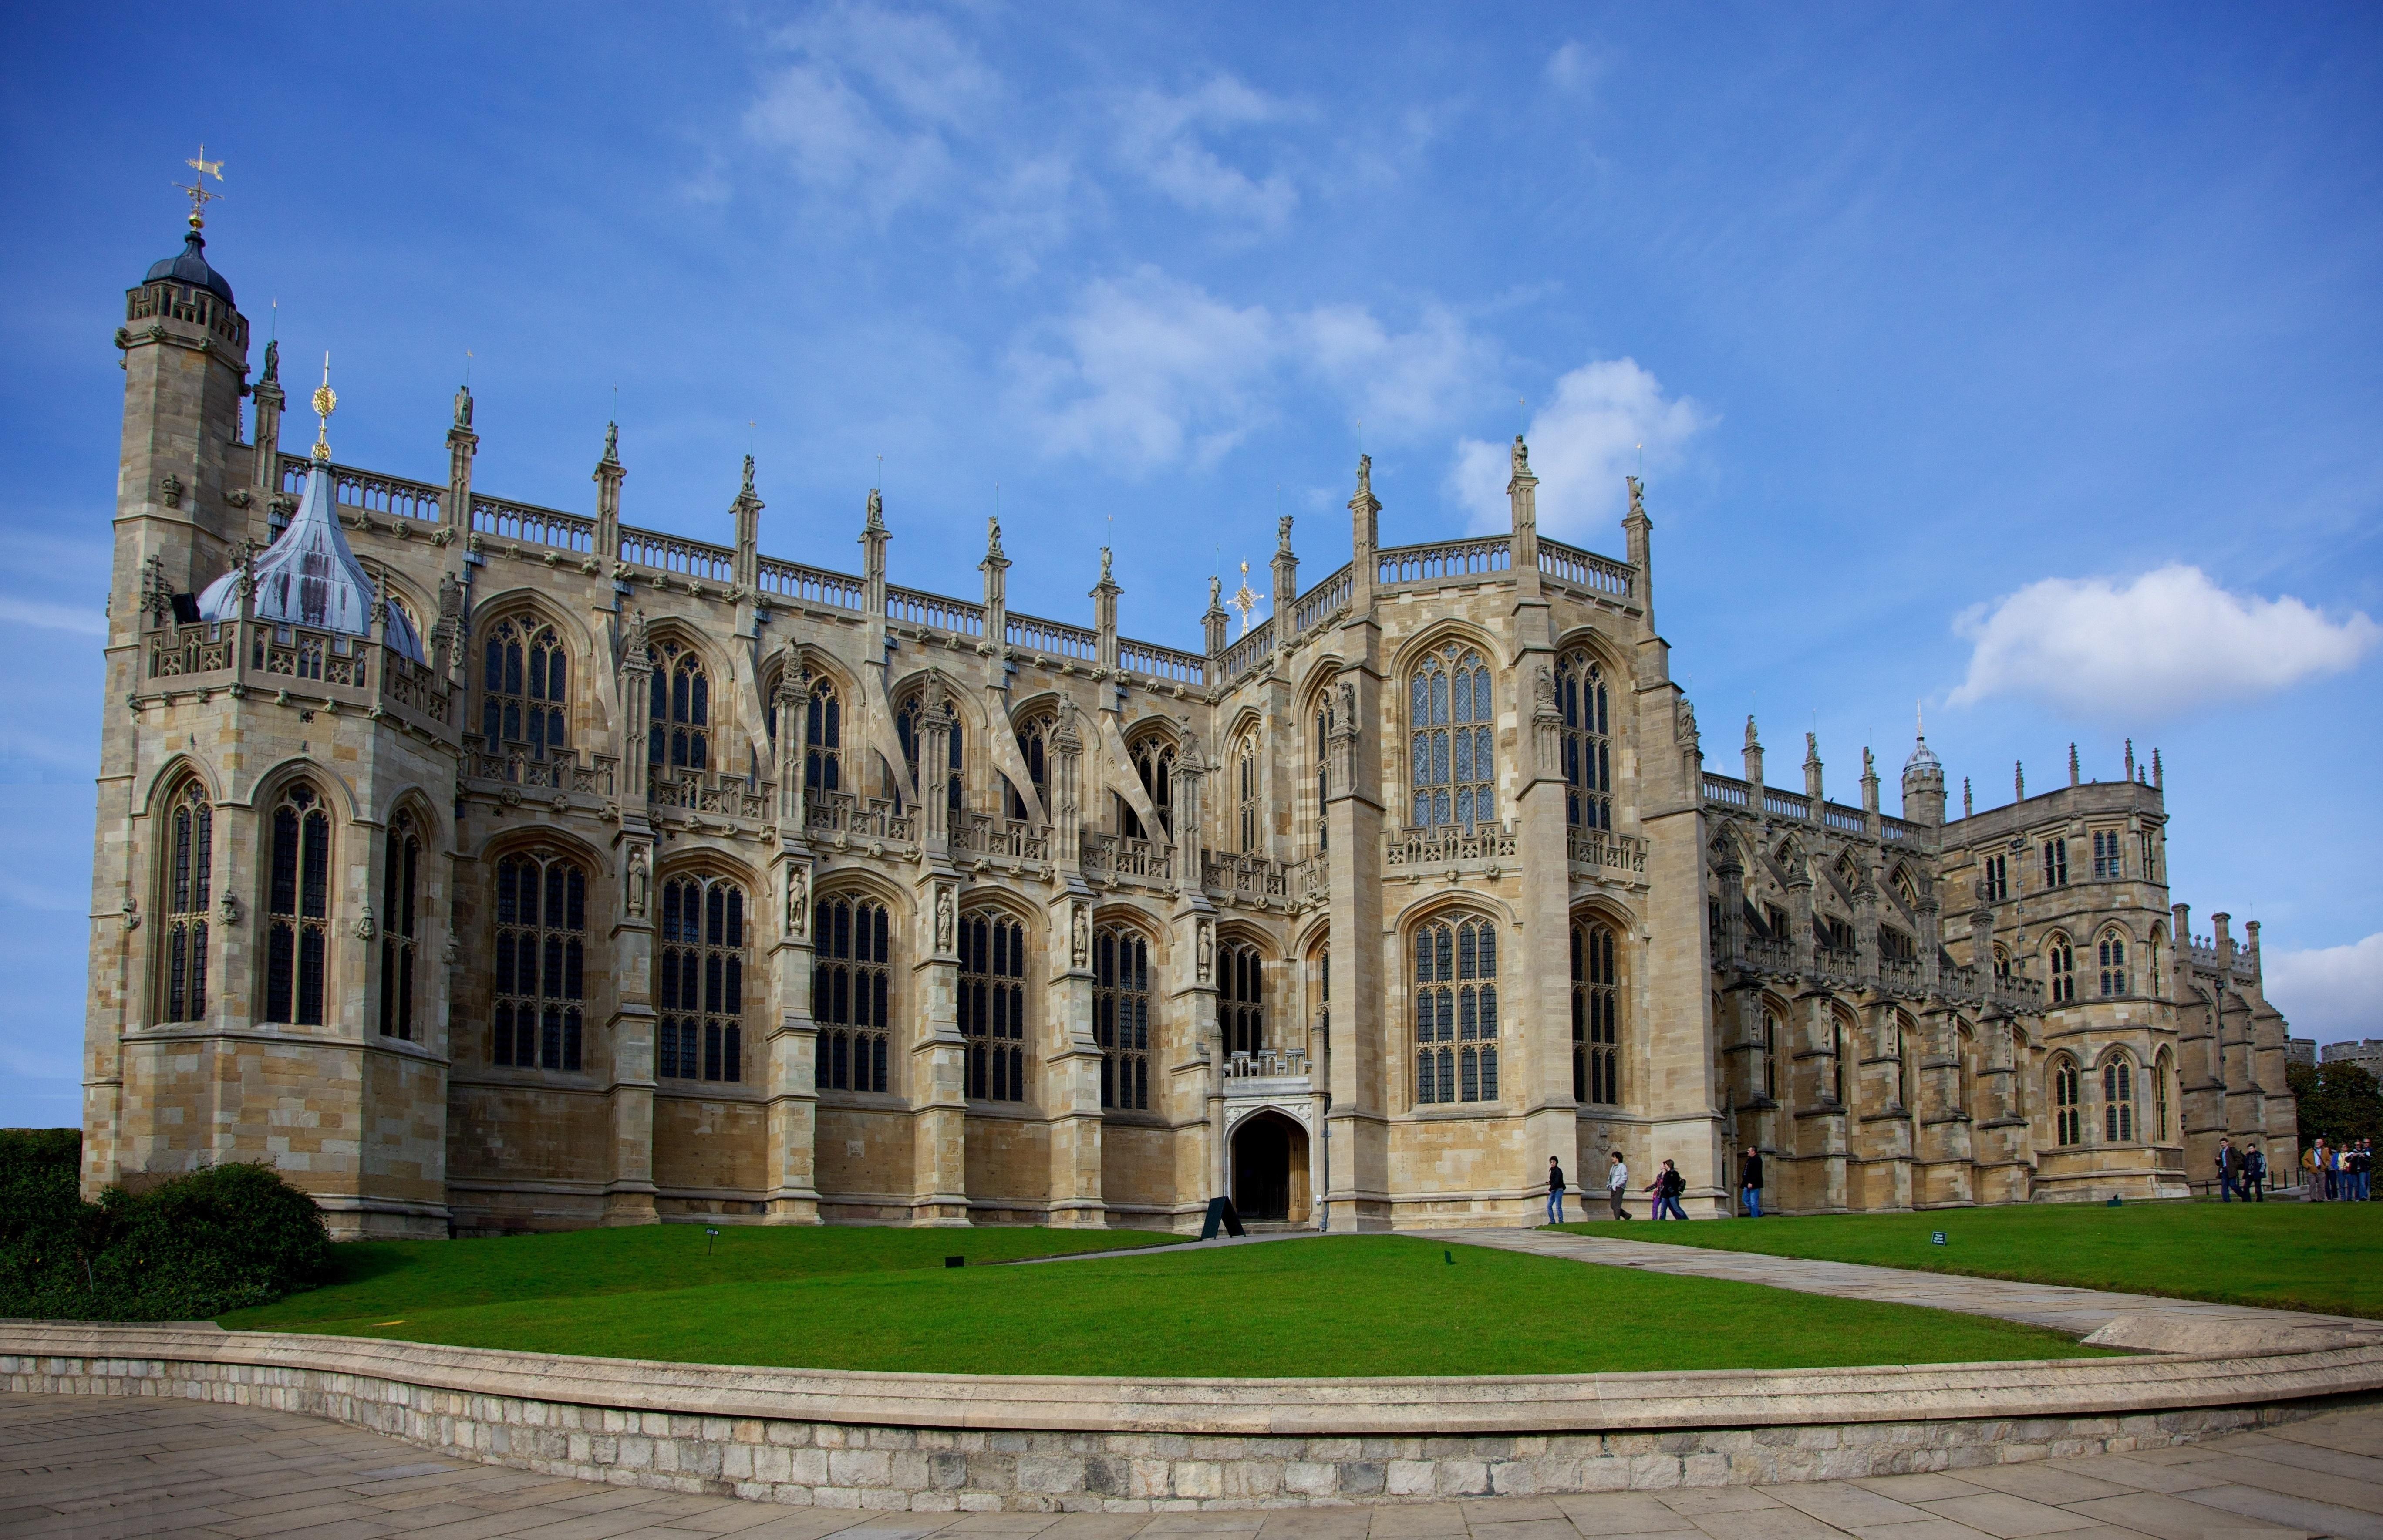 Catedrala Sf. George (sursa Wikipedia)